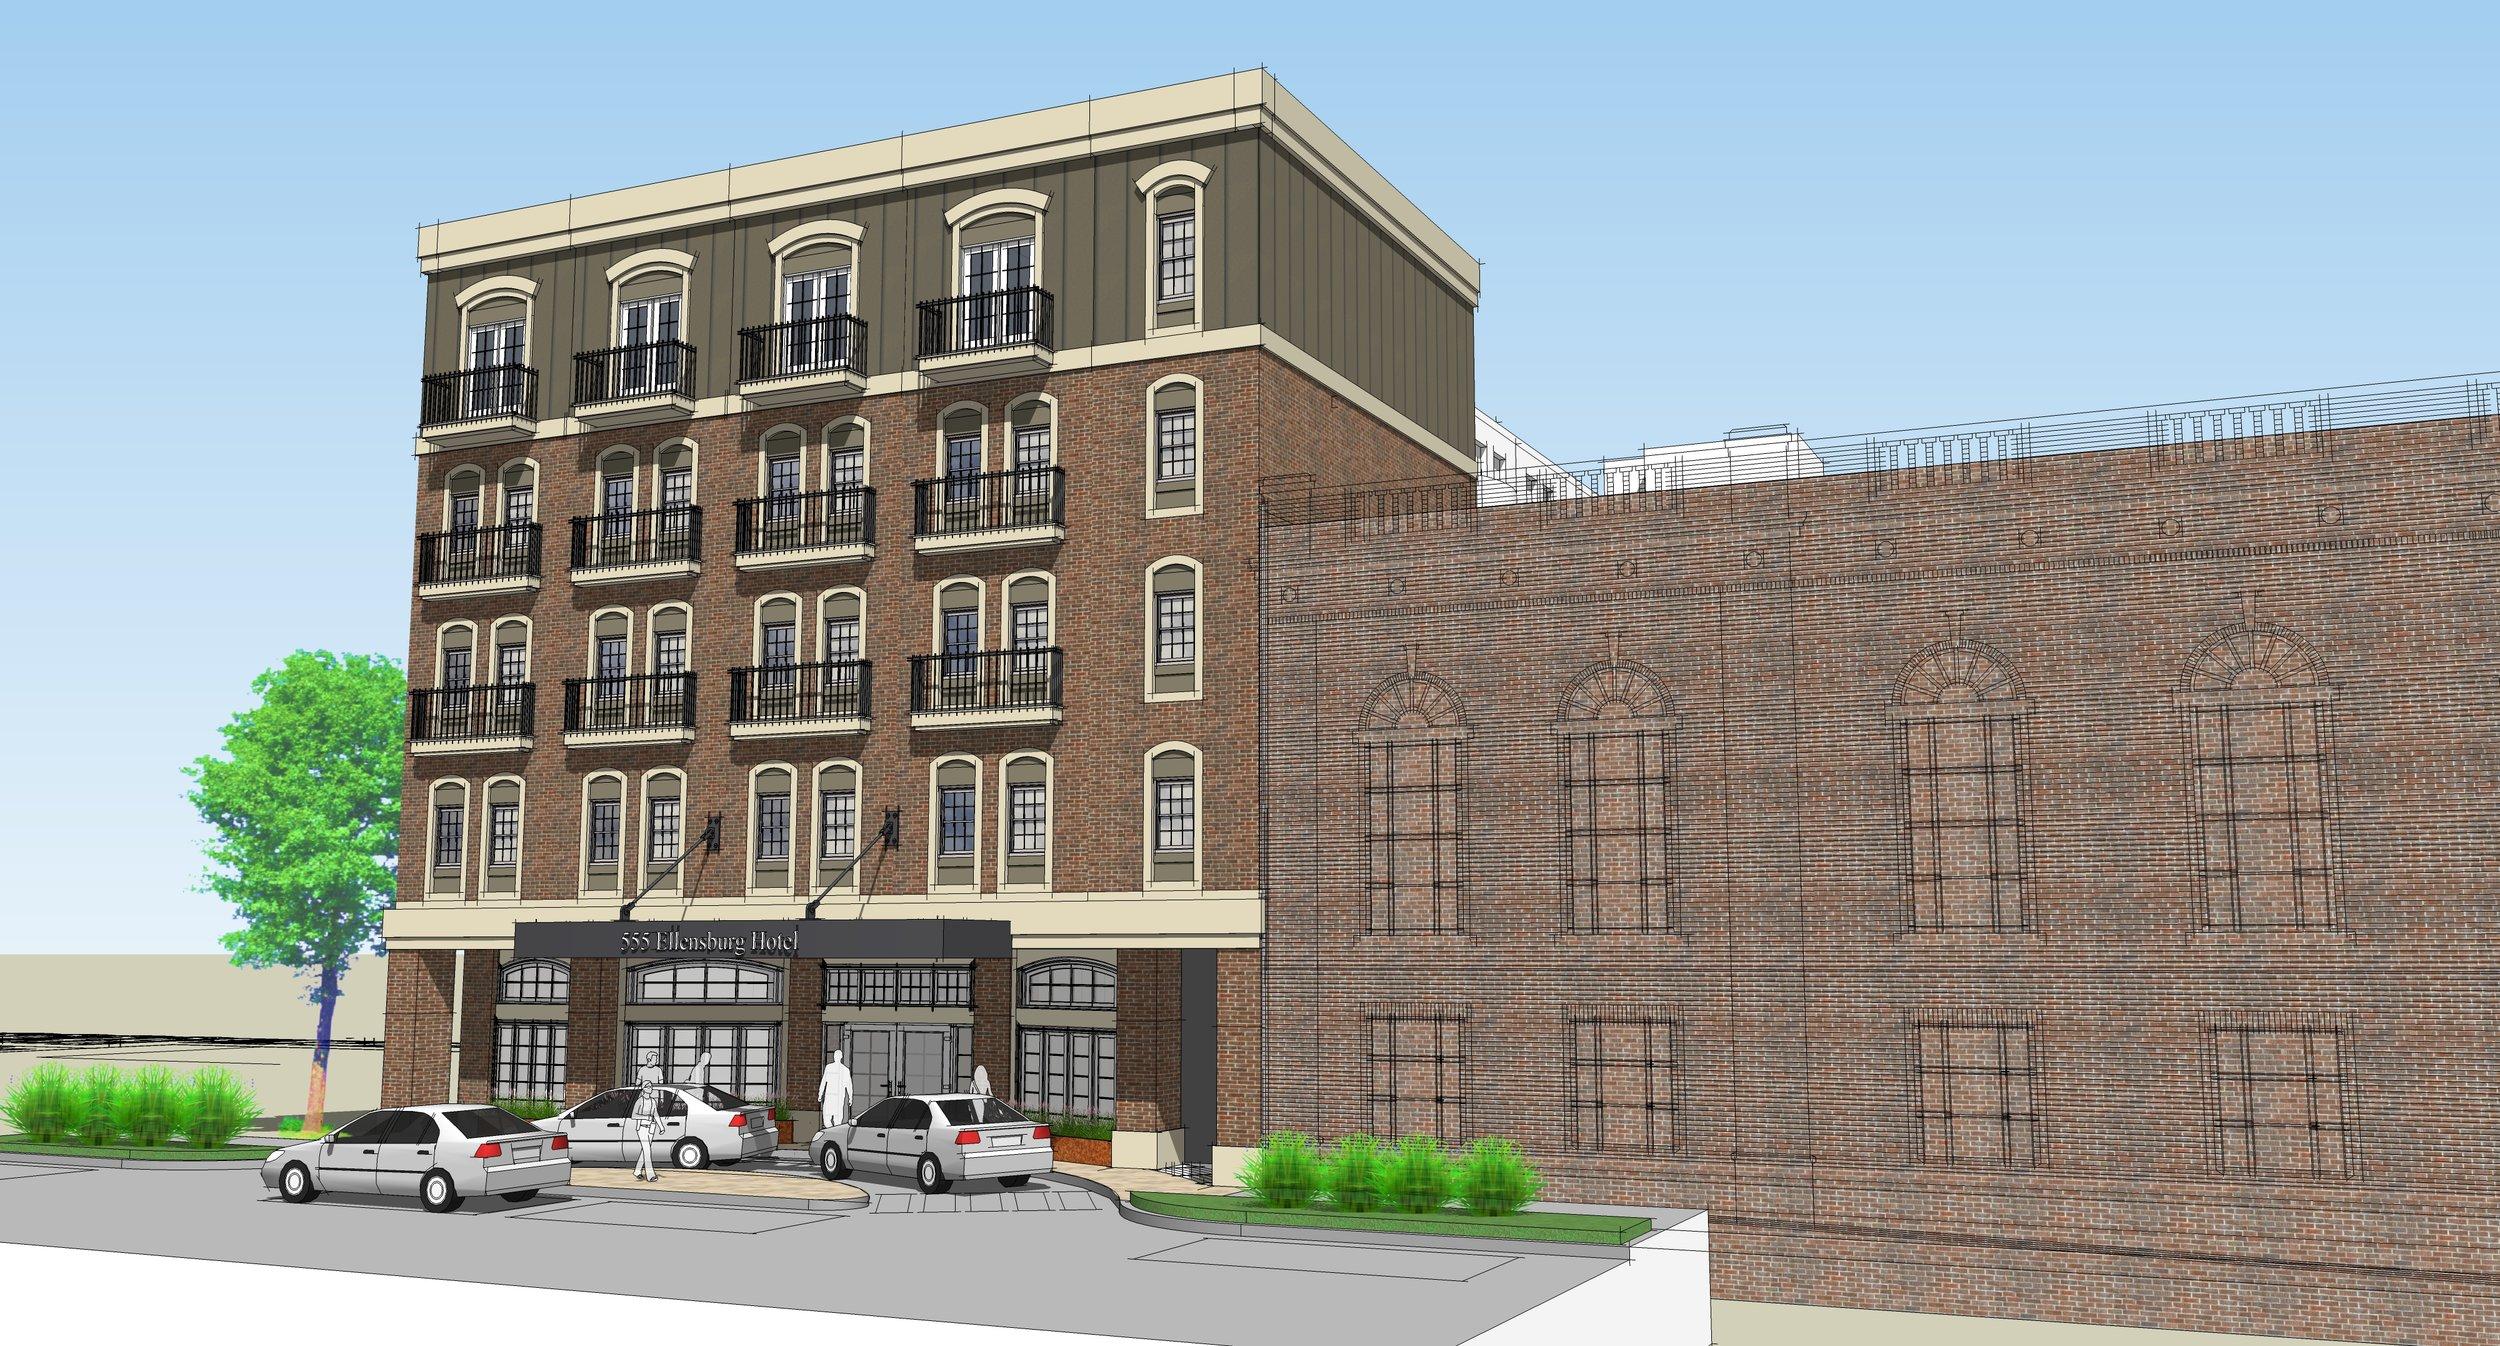 The Ellensburg Hotel project